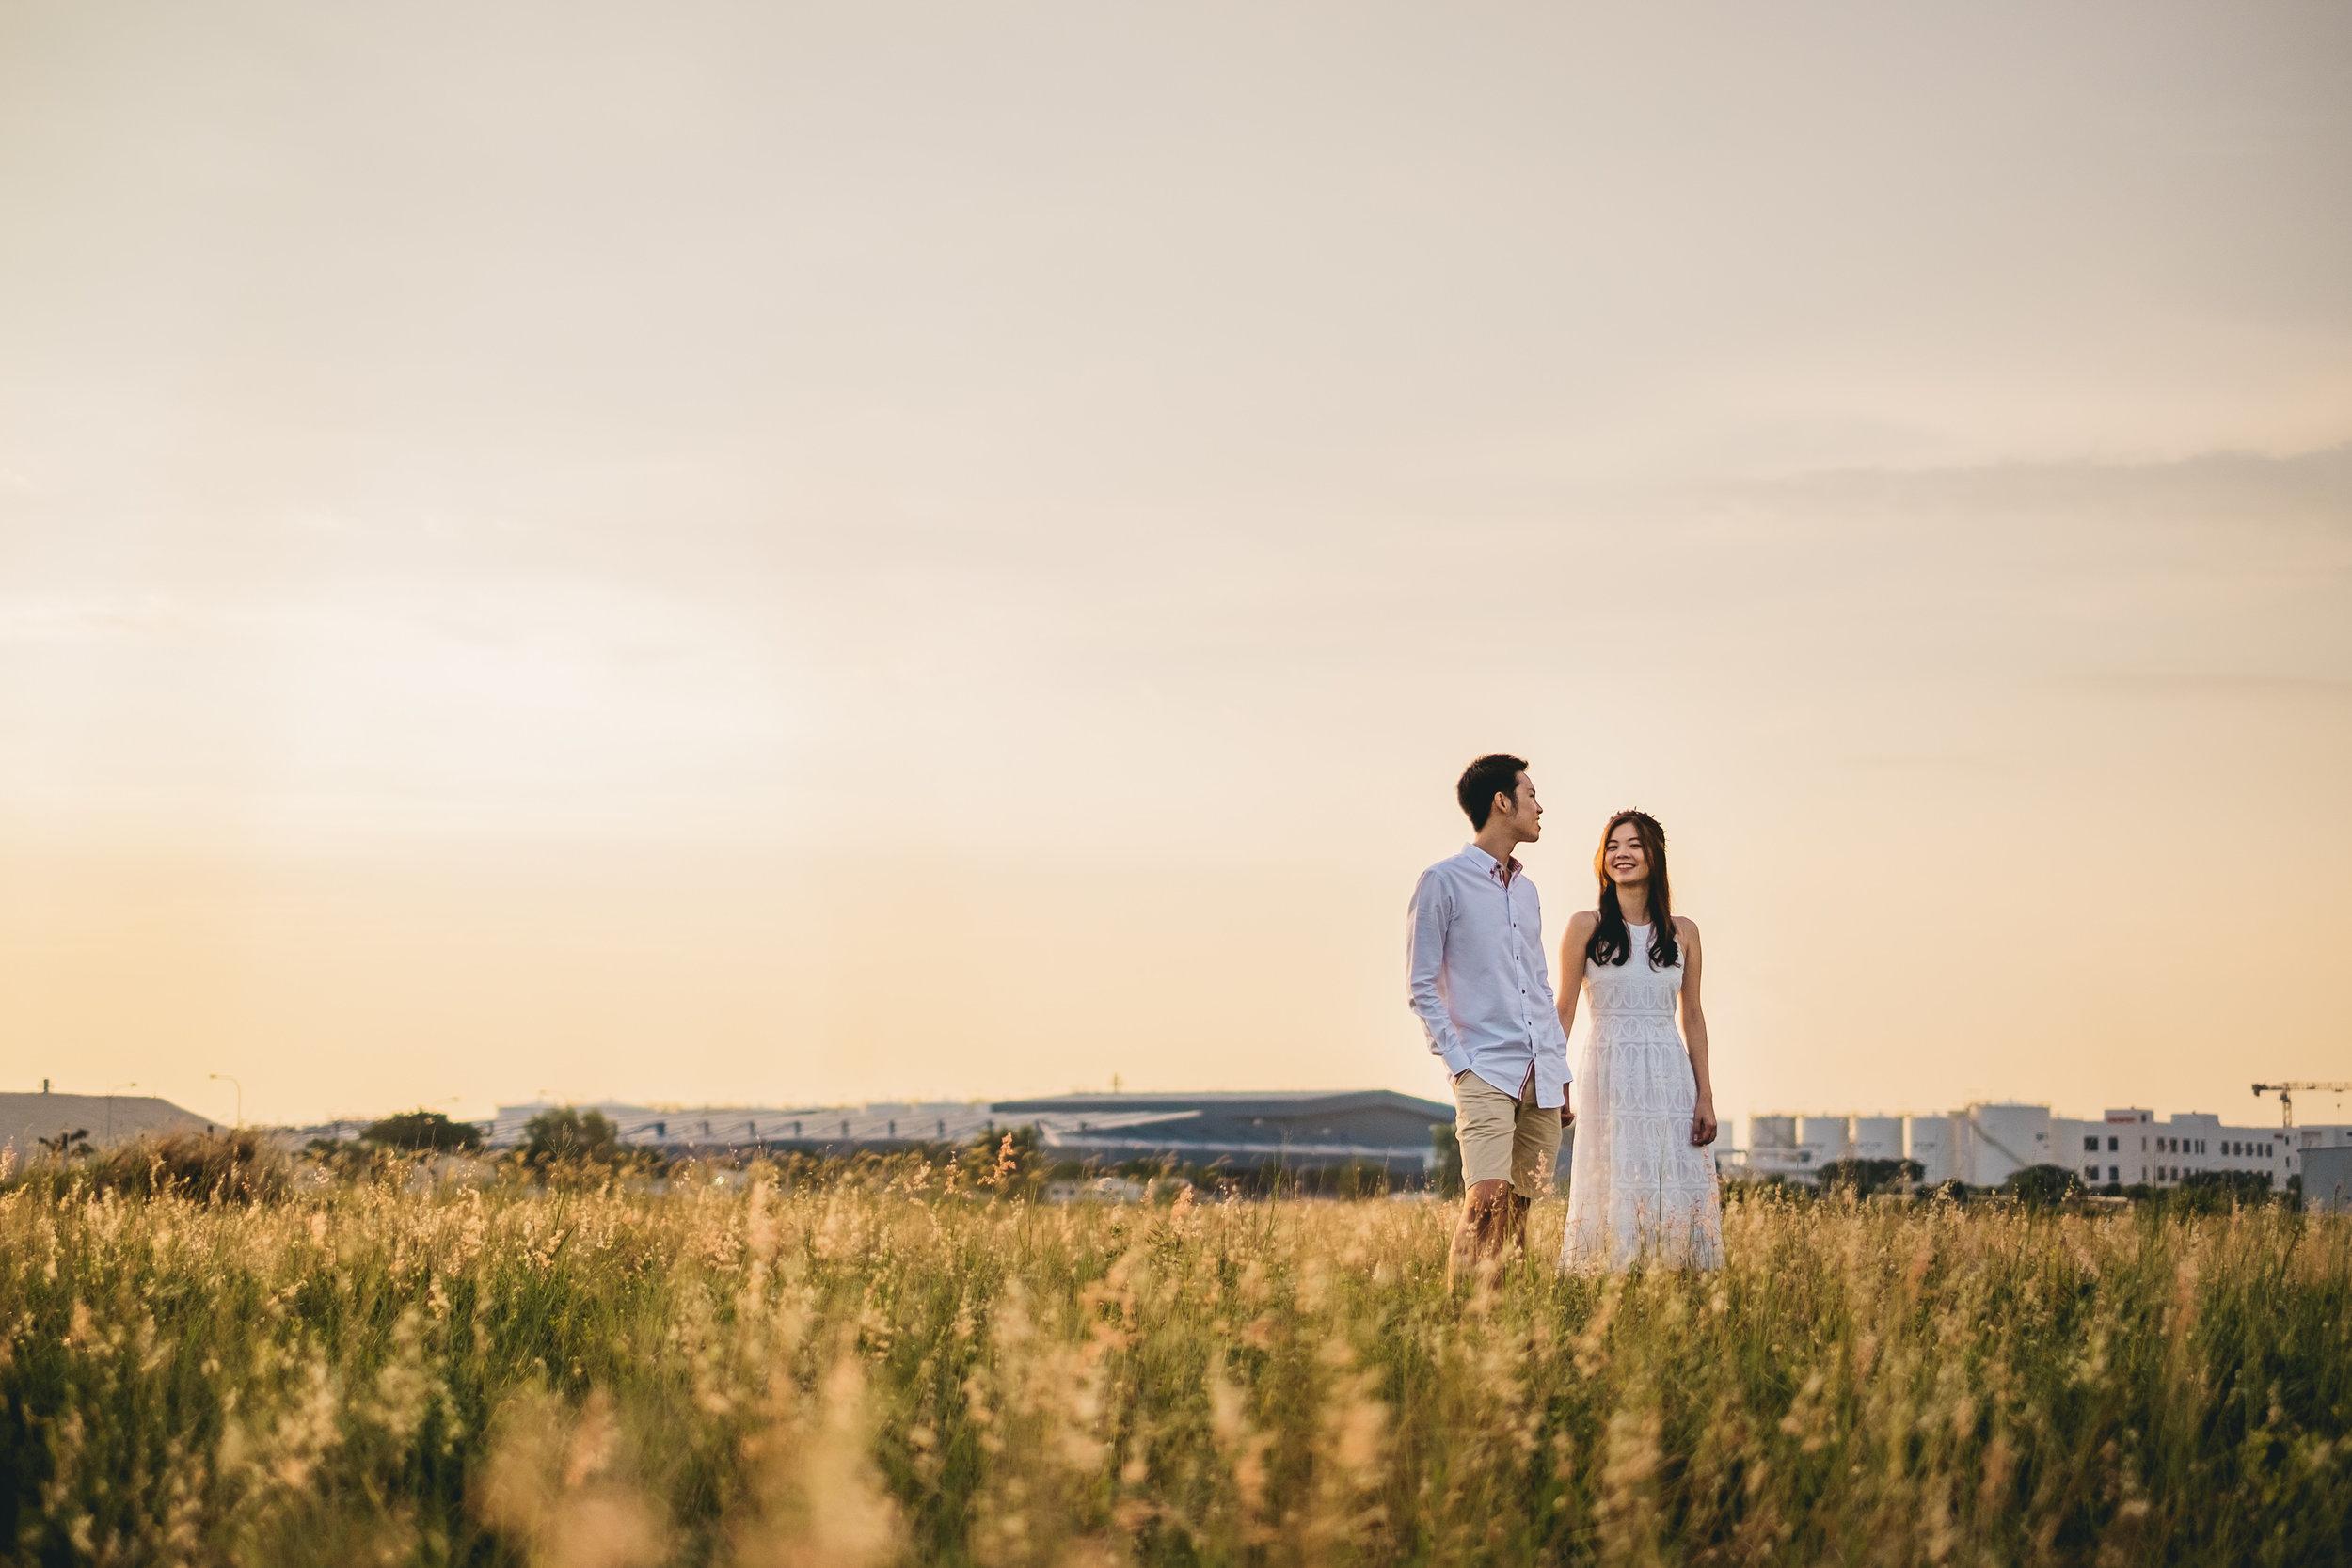 Juxtapose Pix - Pre-Wedding - Mark & Therese - Tuas Sunset 00007.jpg